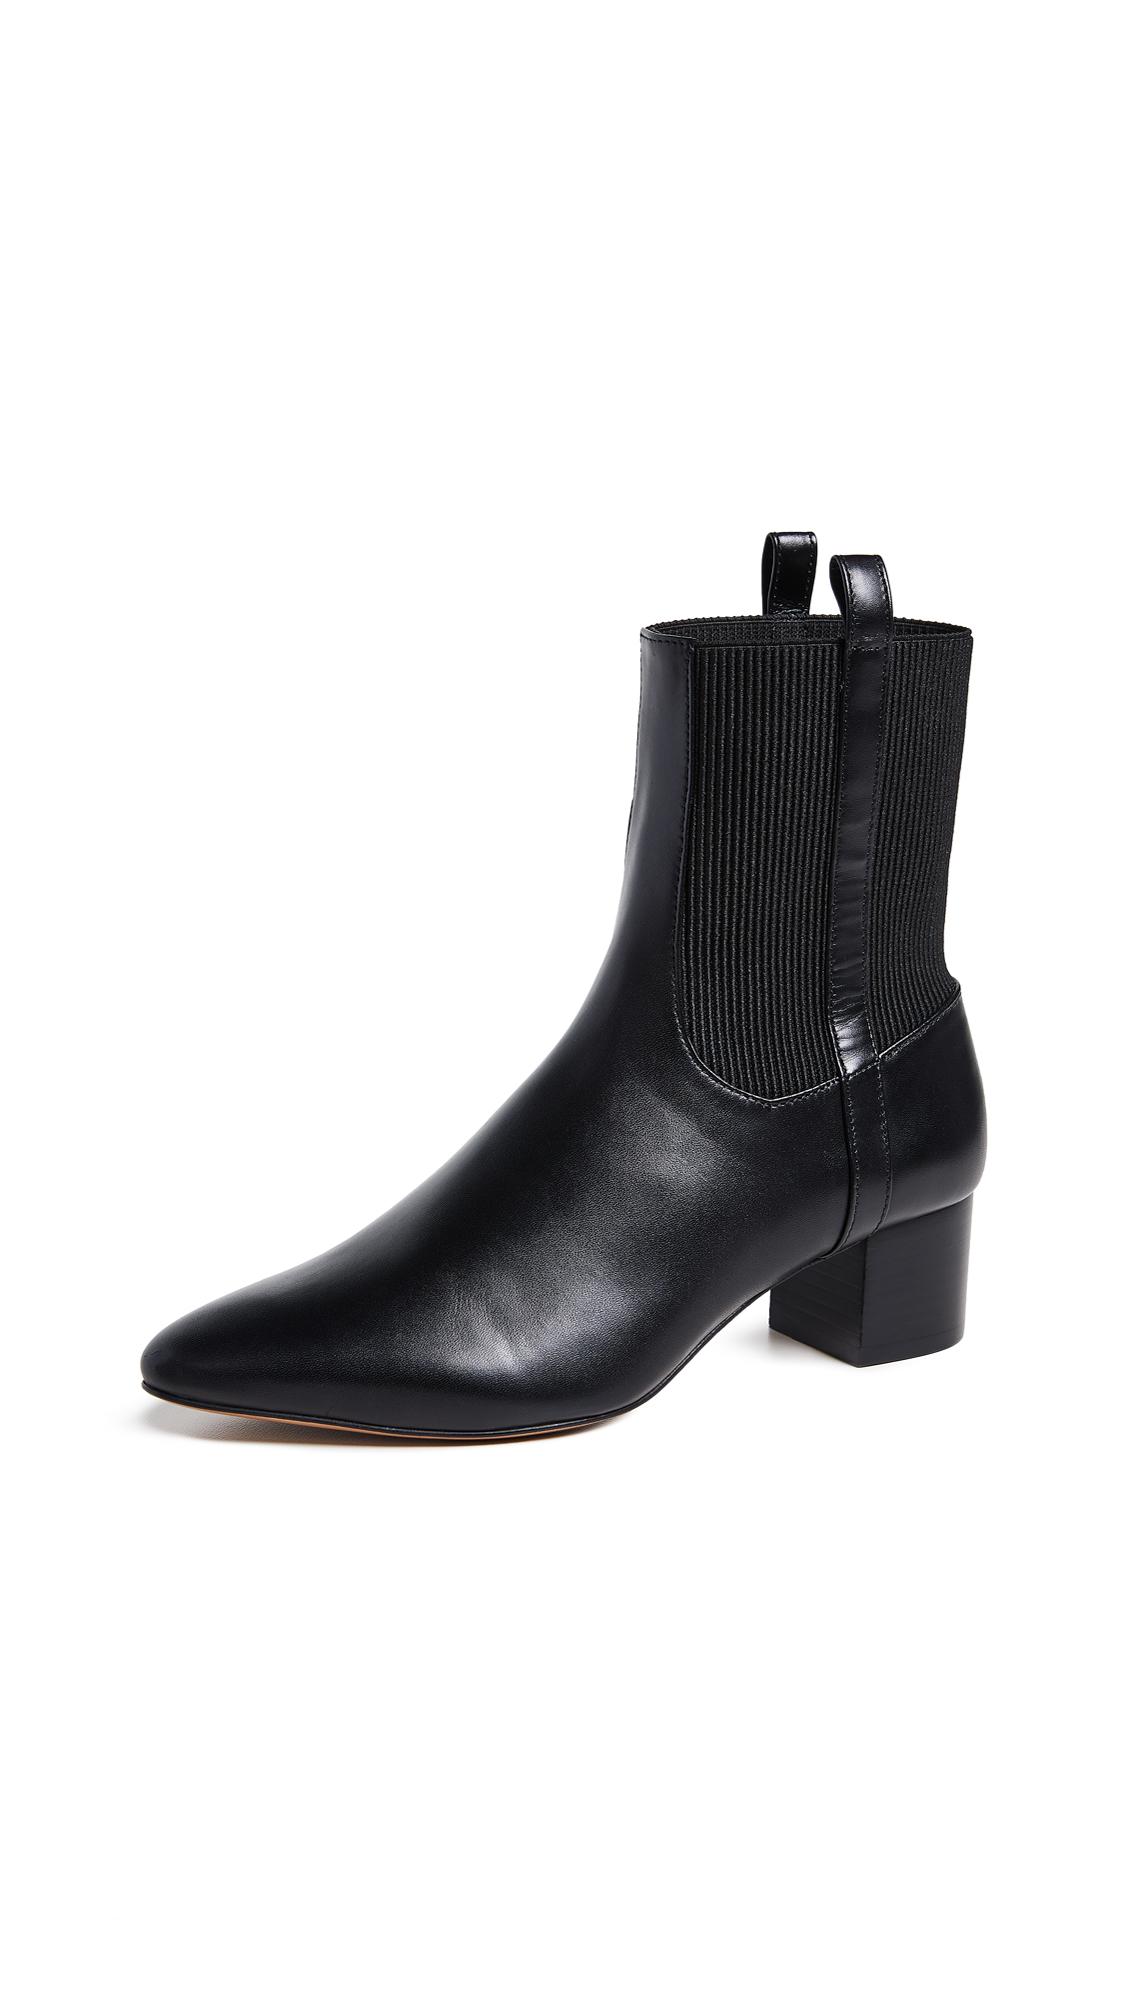 A.P.C. Chantal Boots - Noir